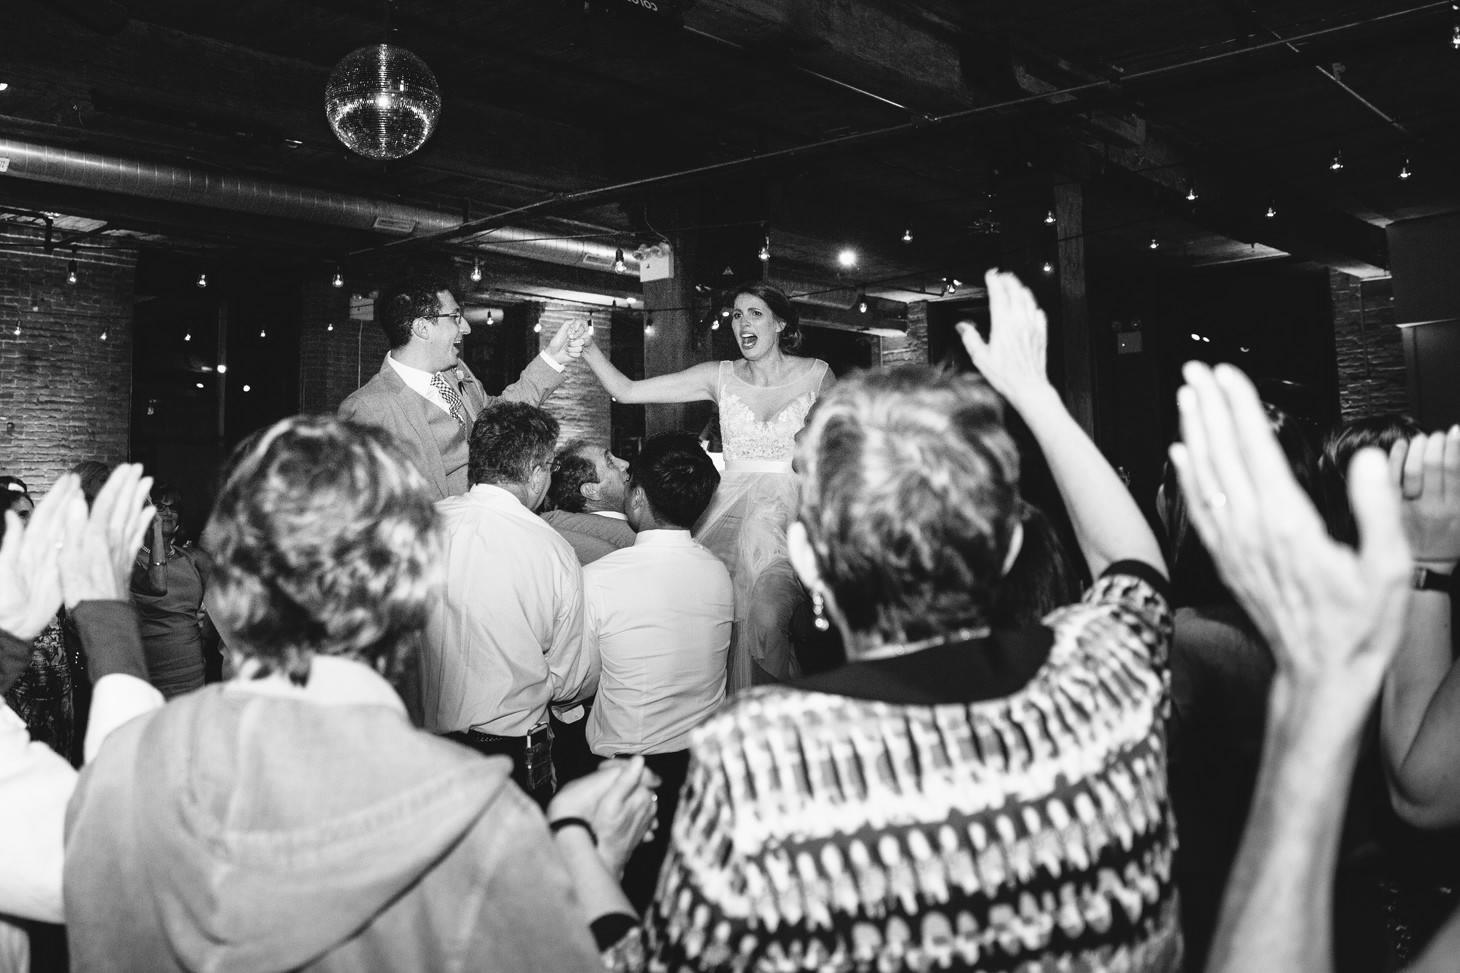 054-nyc-dumbo-loft-brooklyn-wedding-photographer-smitten-chickens-photo-.jpg